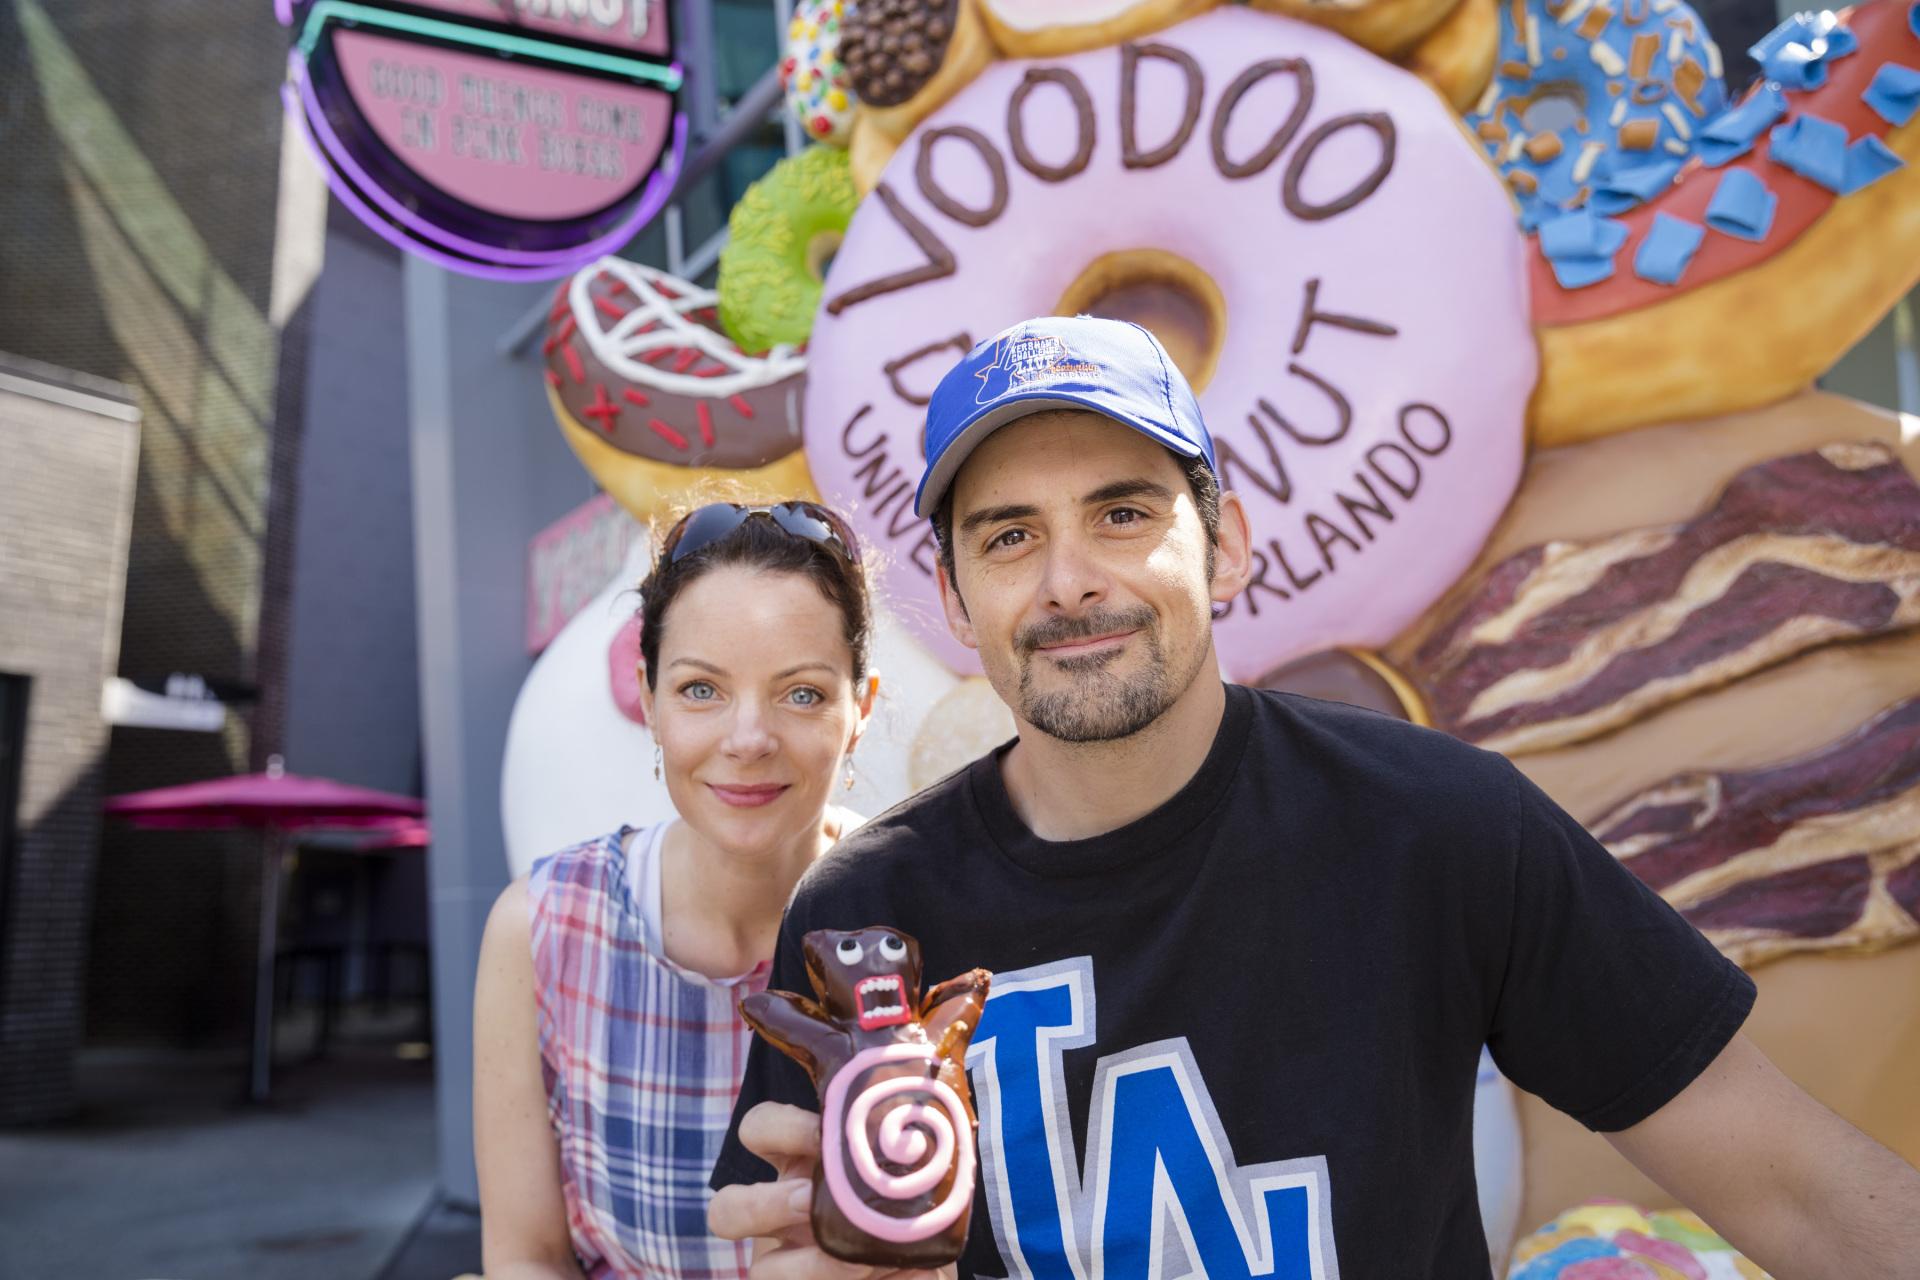 Brad Paisley Enjoys a Voodoo Doll Doughnut at Universal Orlando